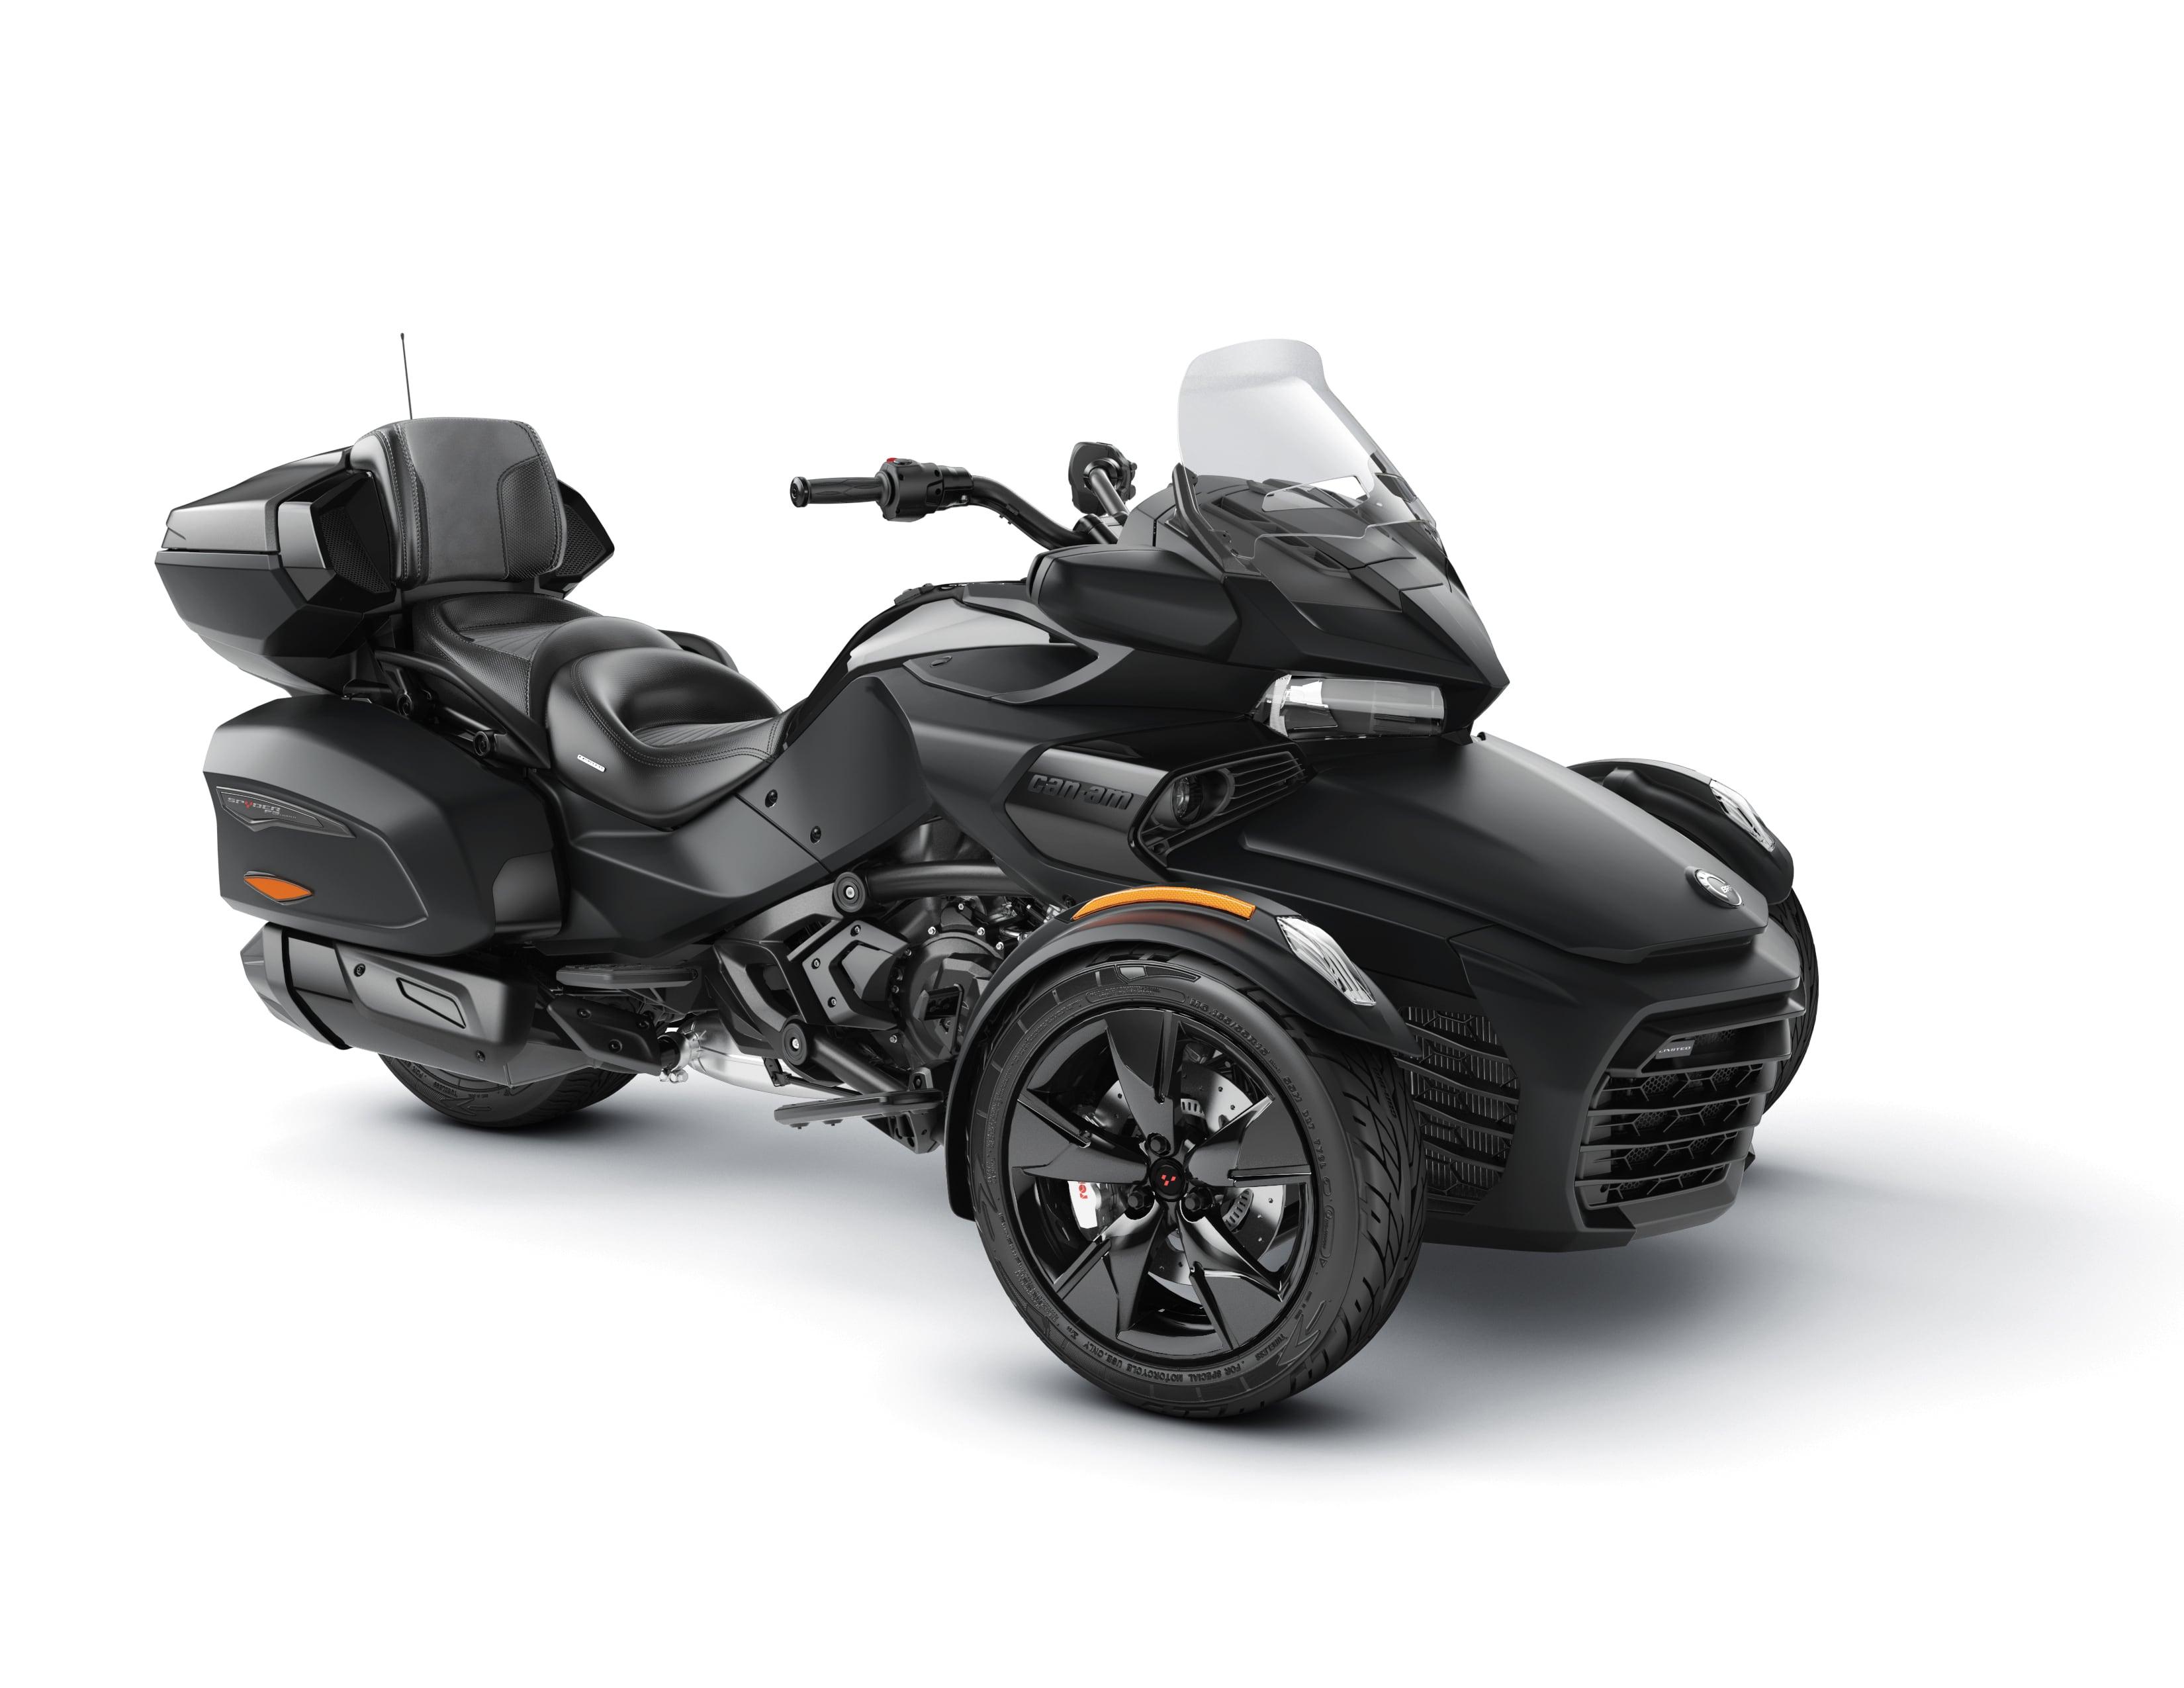 SPYDER F3LTD 1330ACE MONOLITH BLACK 2022